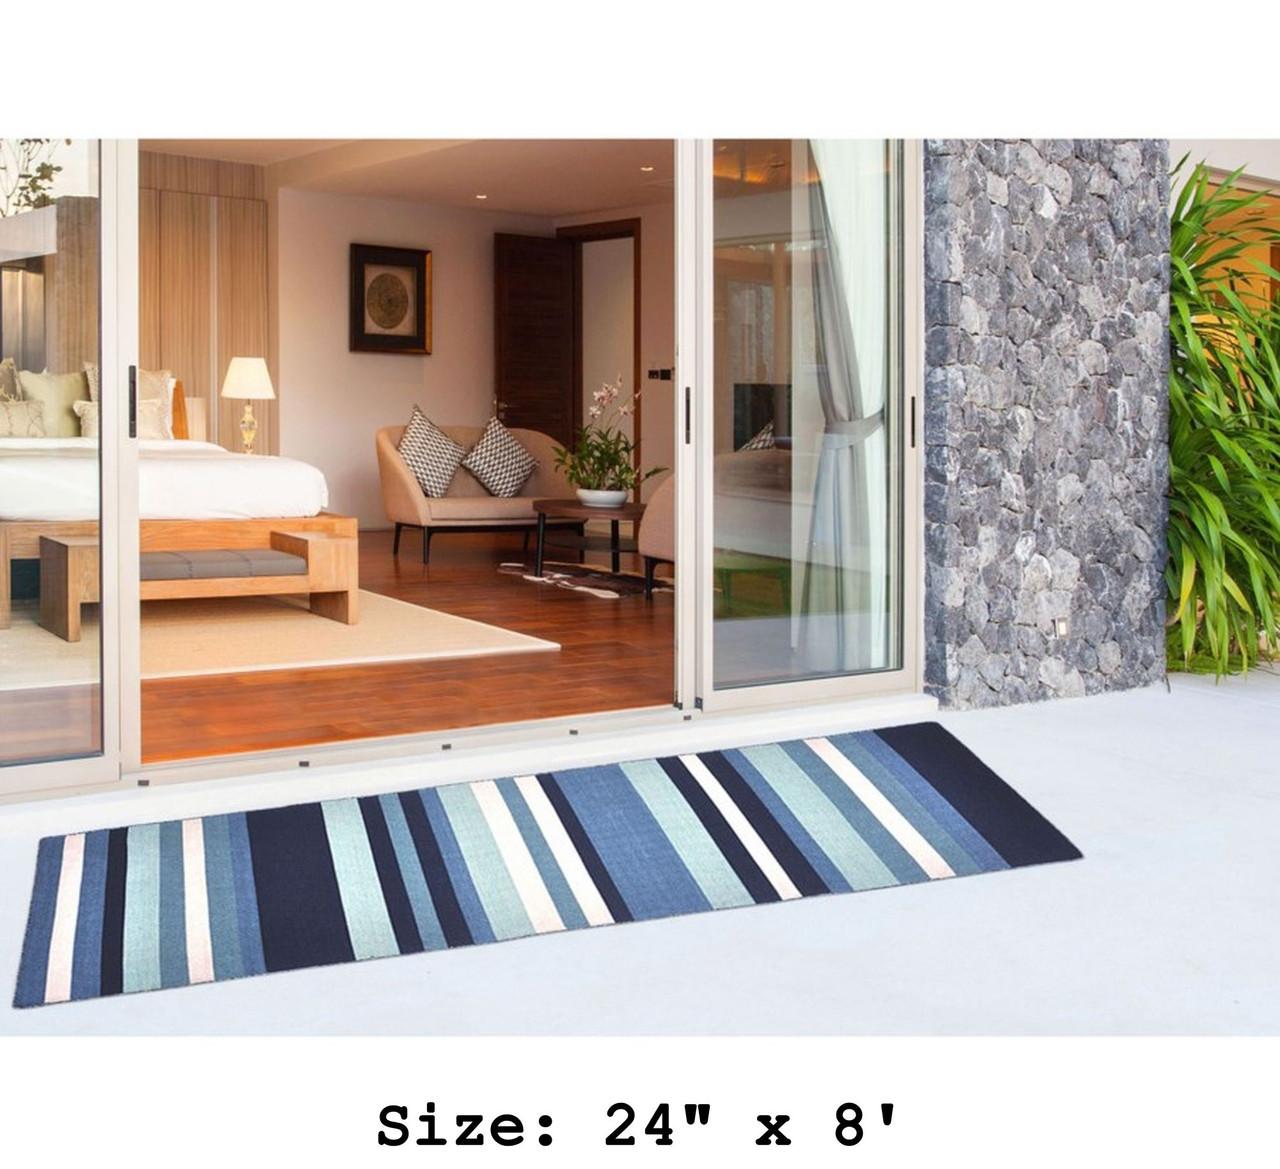 Blue Tribeca Stripes Indoor/Outdoor Rug - Runner Lifestyle